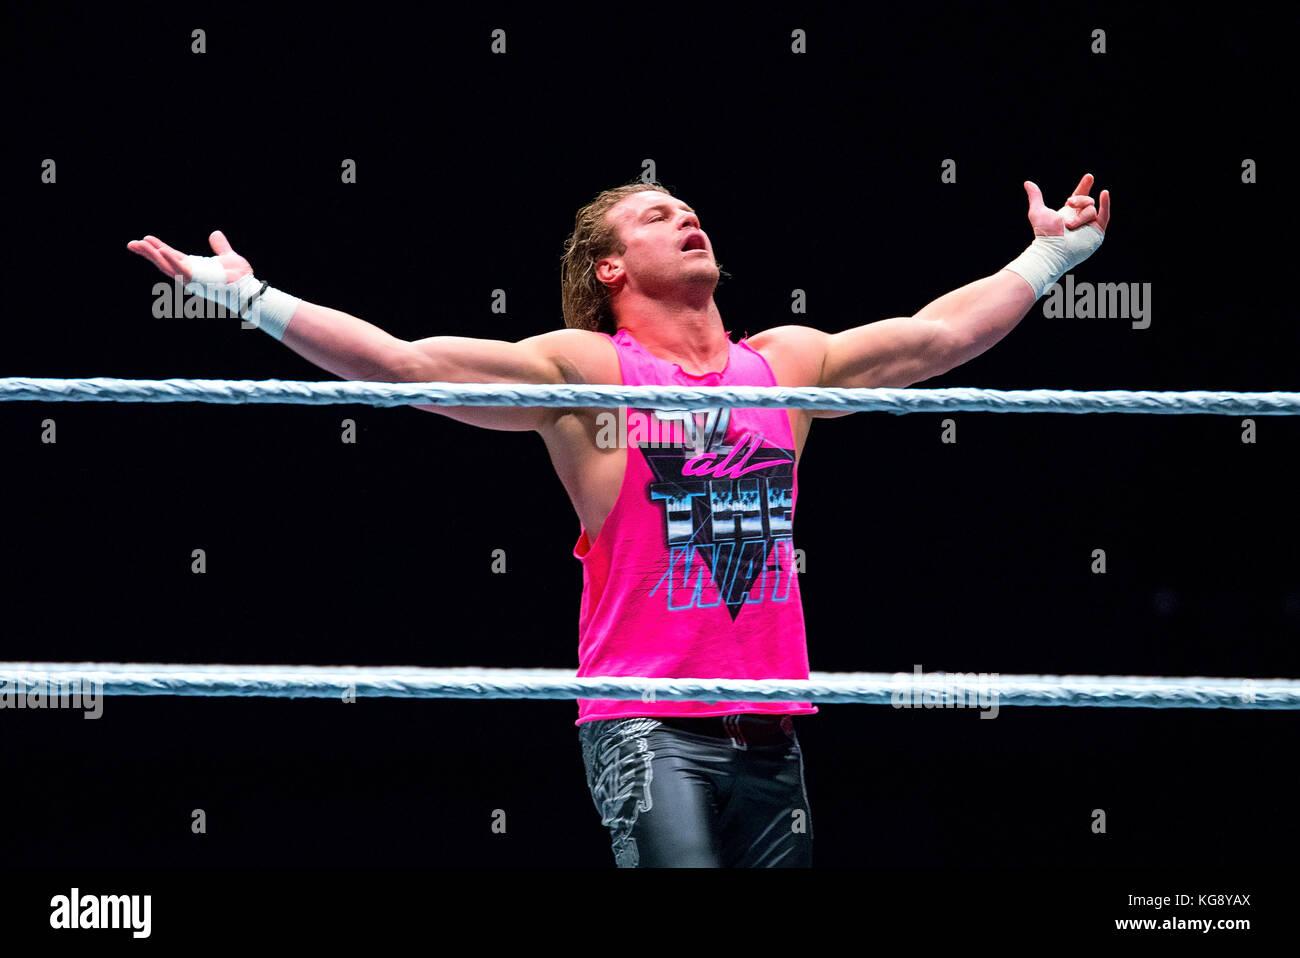 BARCELONA - NOV 4: The wrestler Dolph Ziggler in action at WWE Live at the Palau Sant Jordi on November 4, 2017 - Stock Image